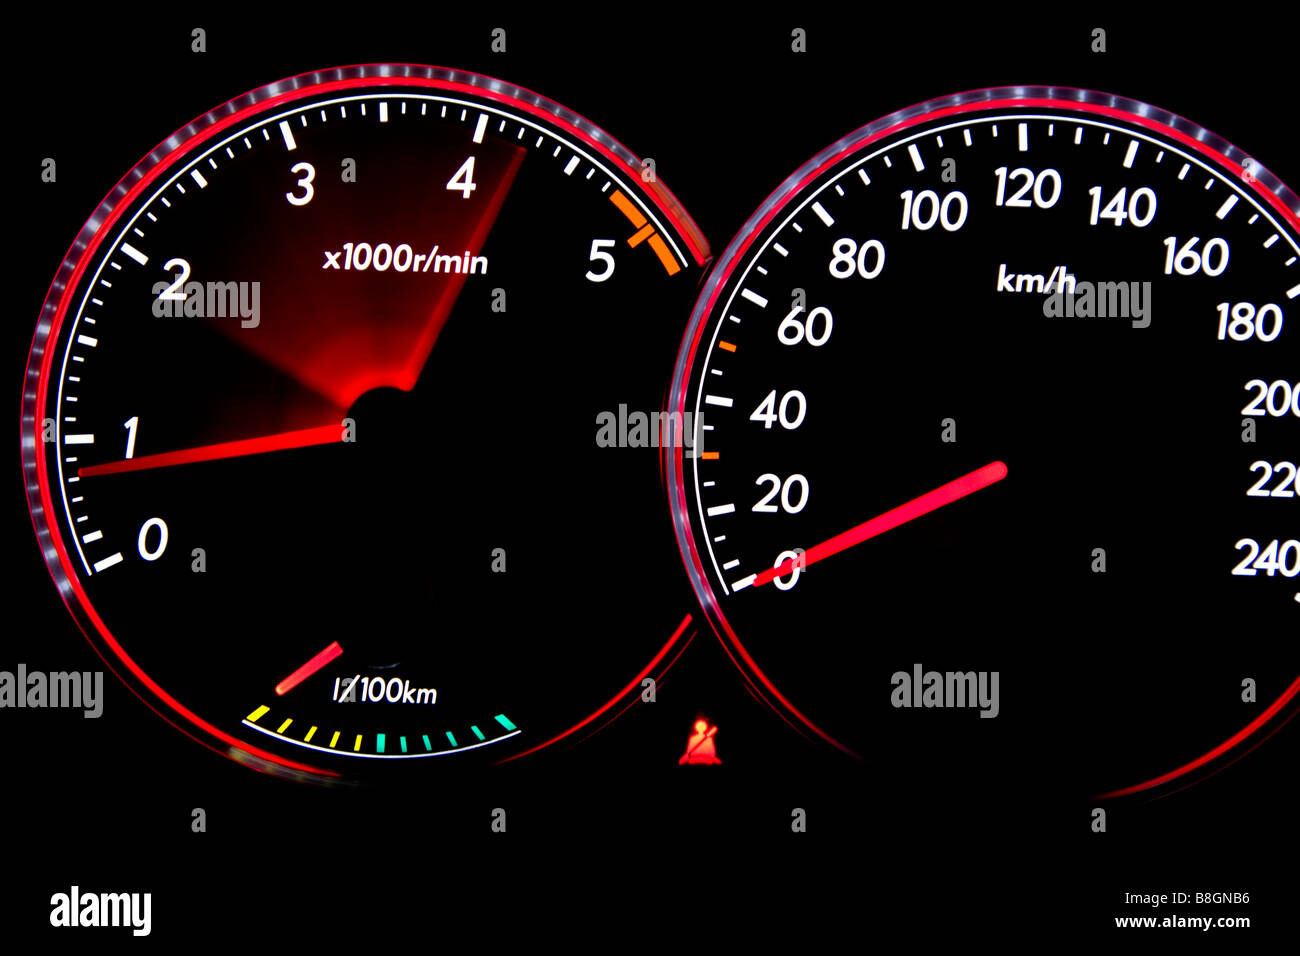 speedometer and rpm meter stock photo 22495626 alamy